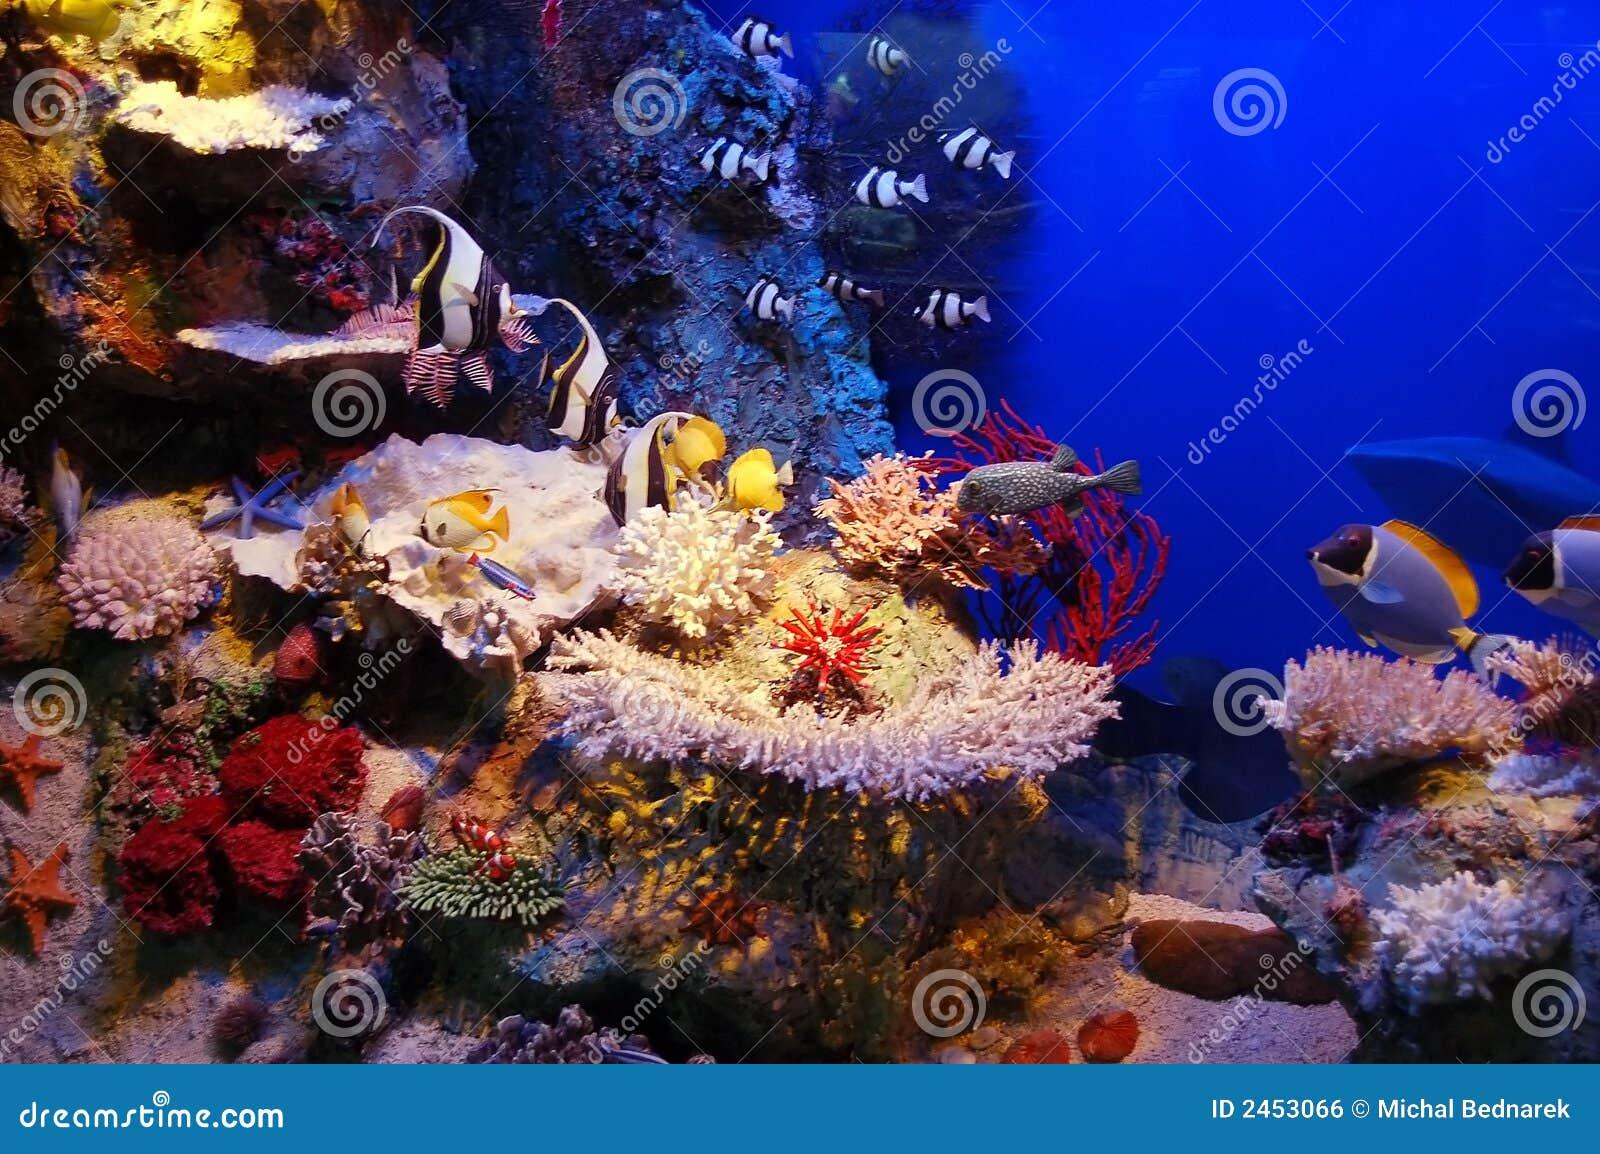 underwater scene stock photo. image of underwater, bubbles - 2453066